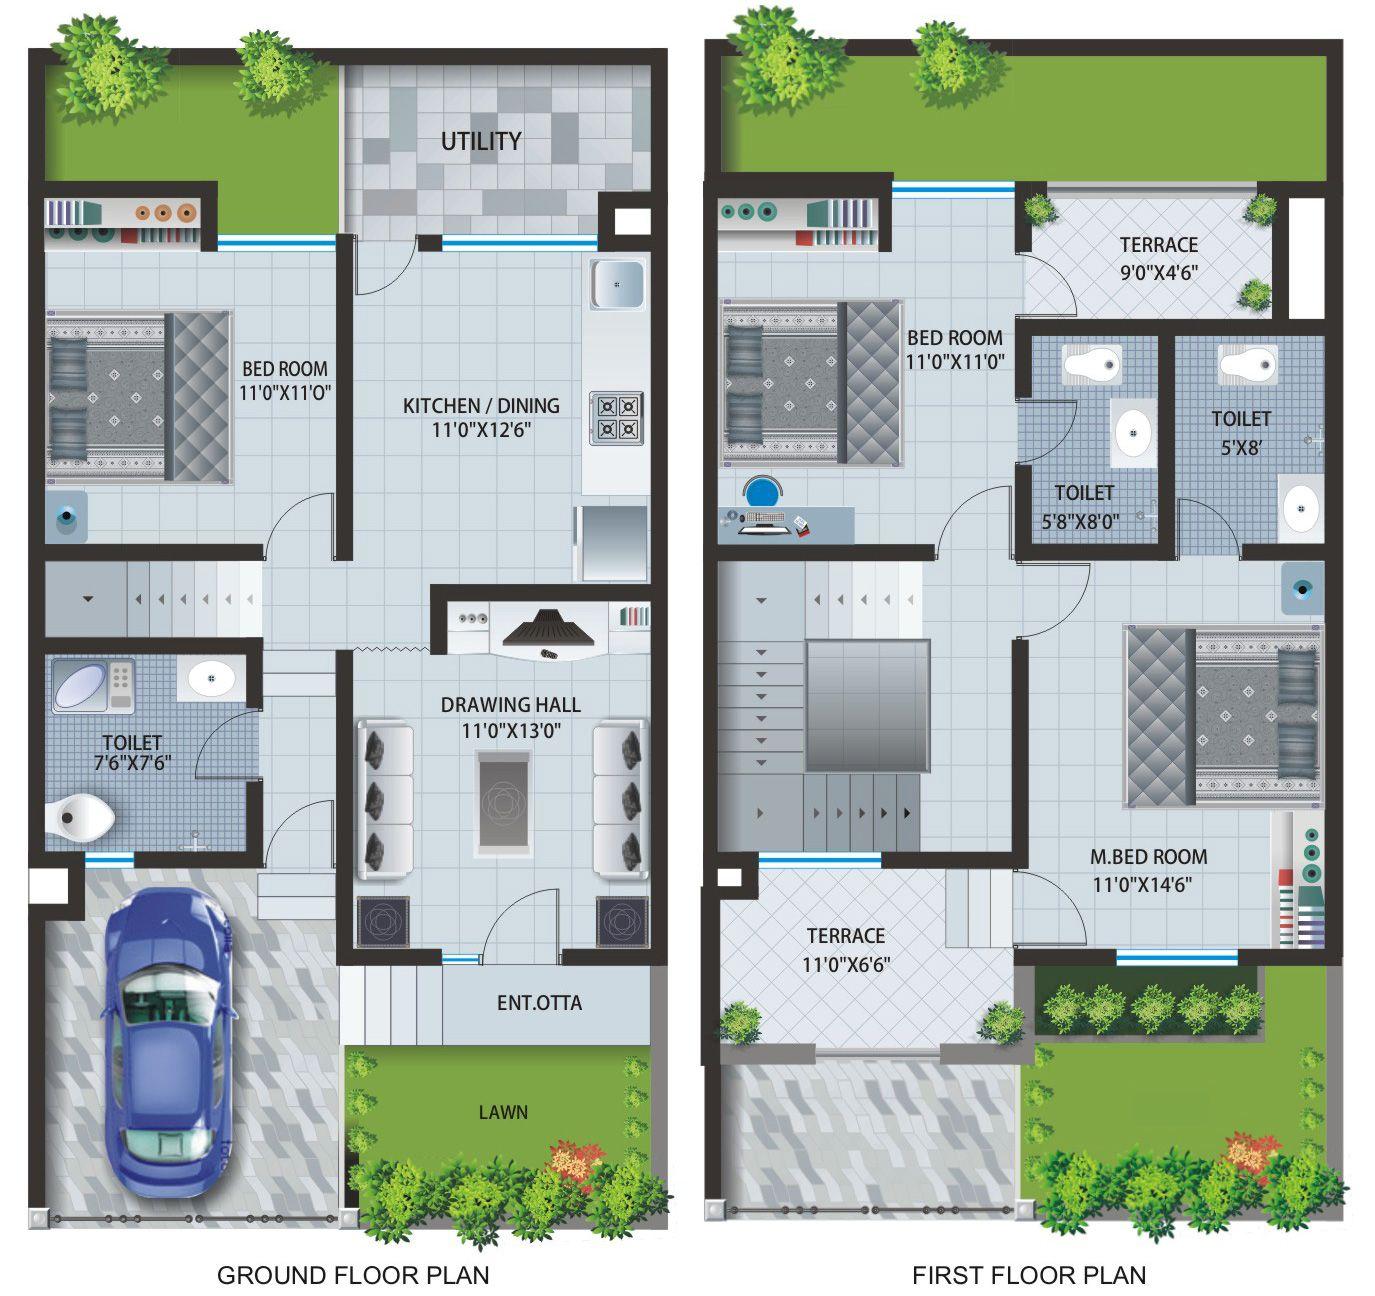 Prime 17 Best Images About Plans On Pinterest House Plans Building Largest Home Design Picture Inspirations Pitcheantrous